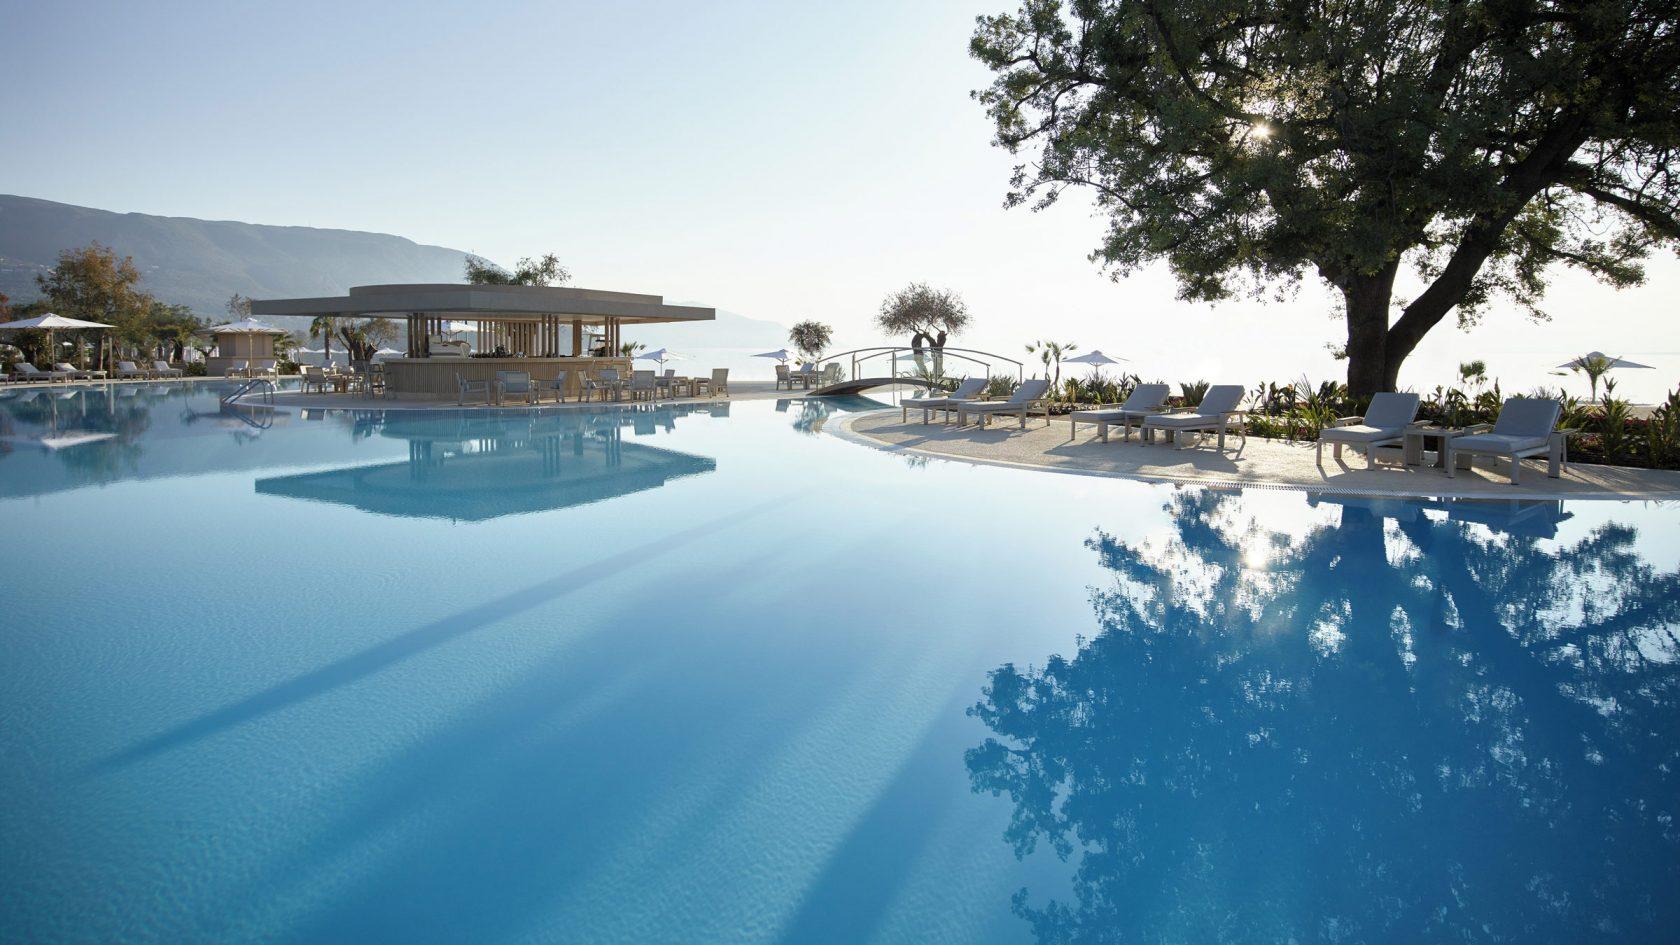 Ikos Dassia – Luxushotel & All-Inclusive Resort Korfu, Griechenland